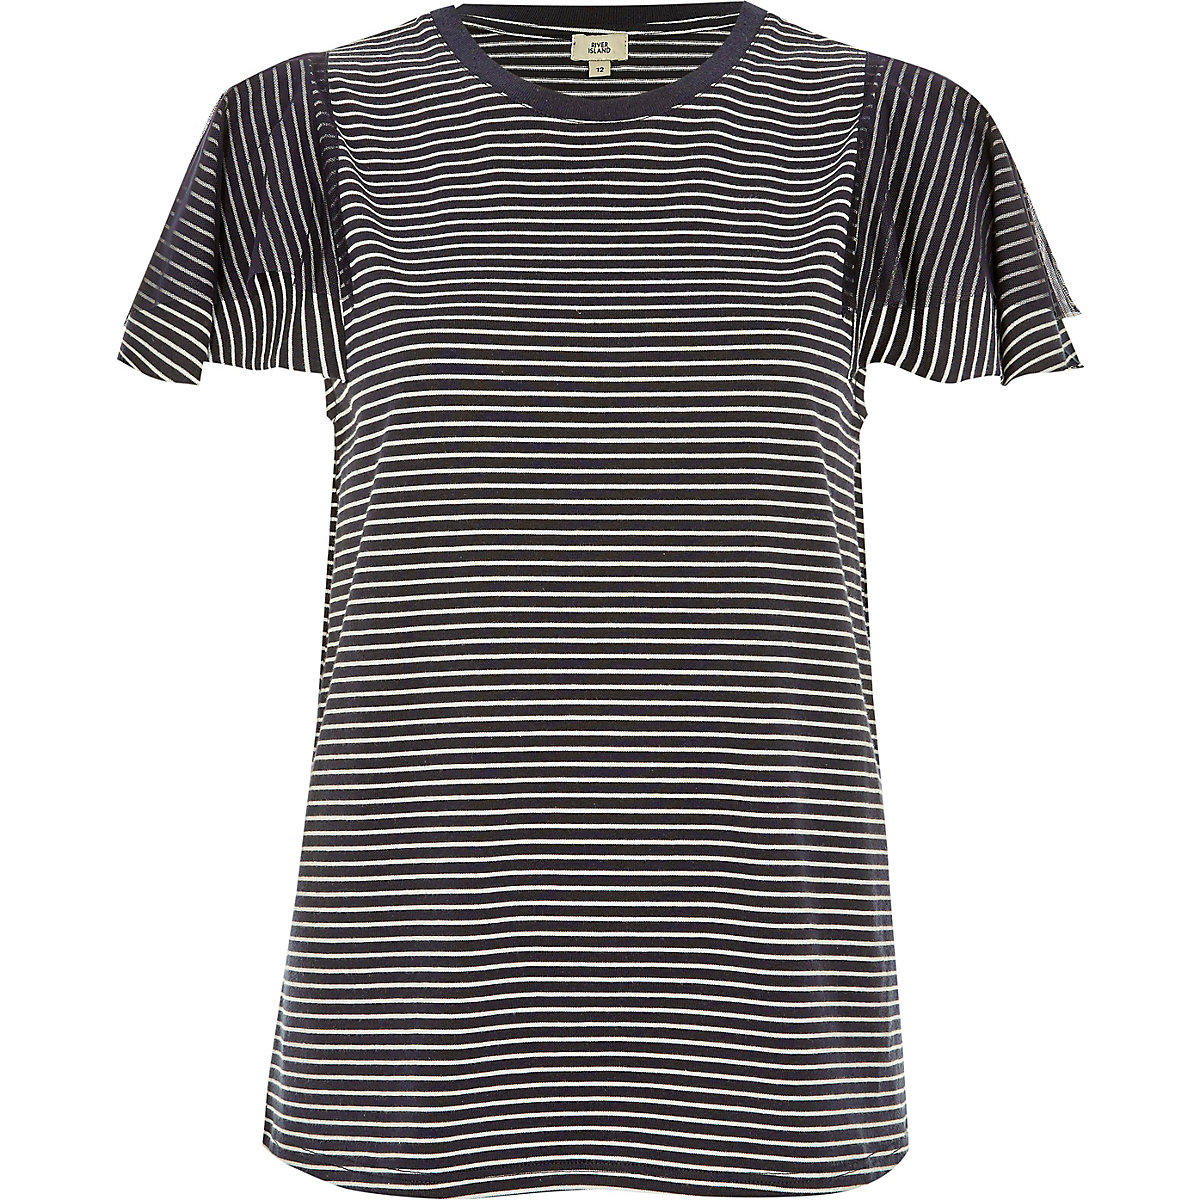 Navy stripe short mesh sleeve T-shirt